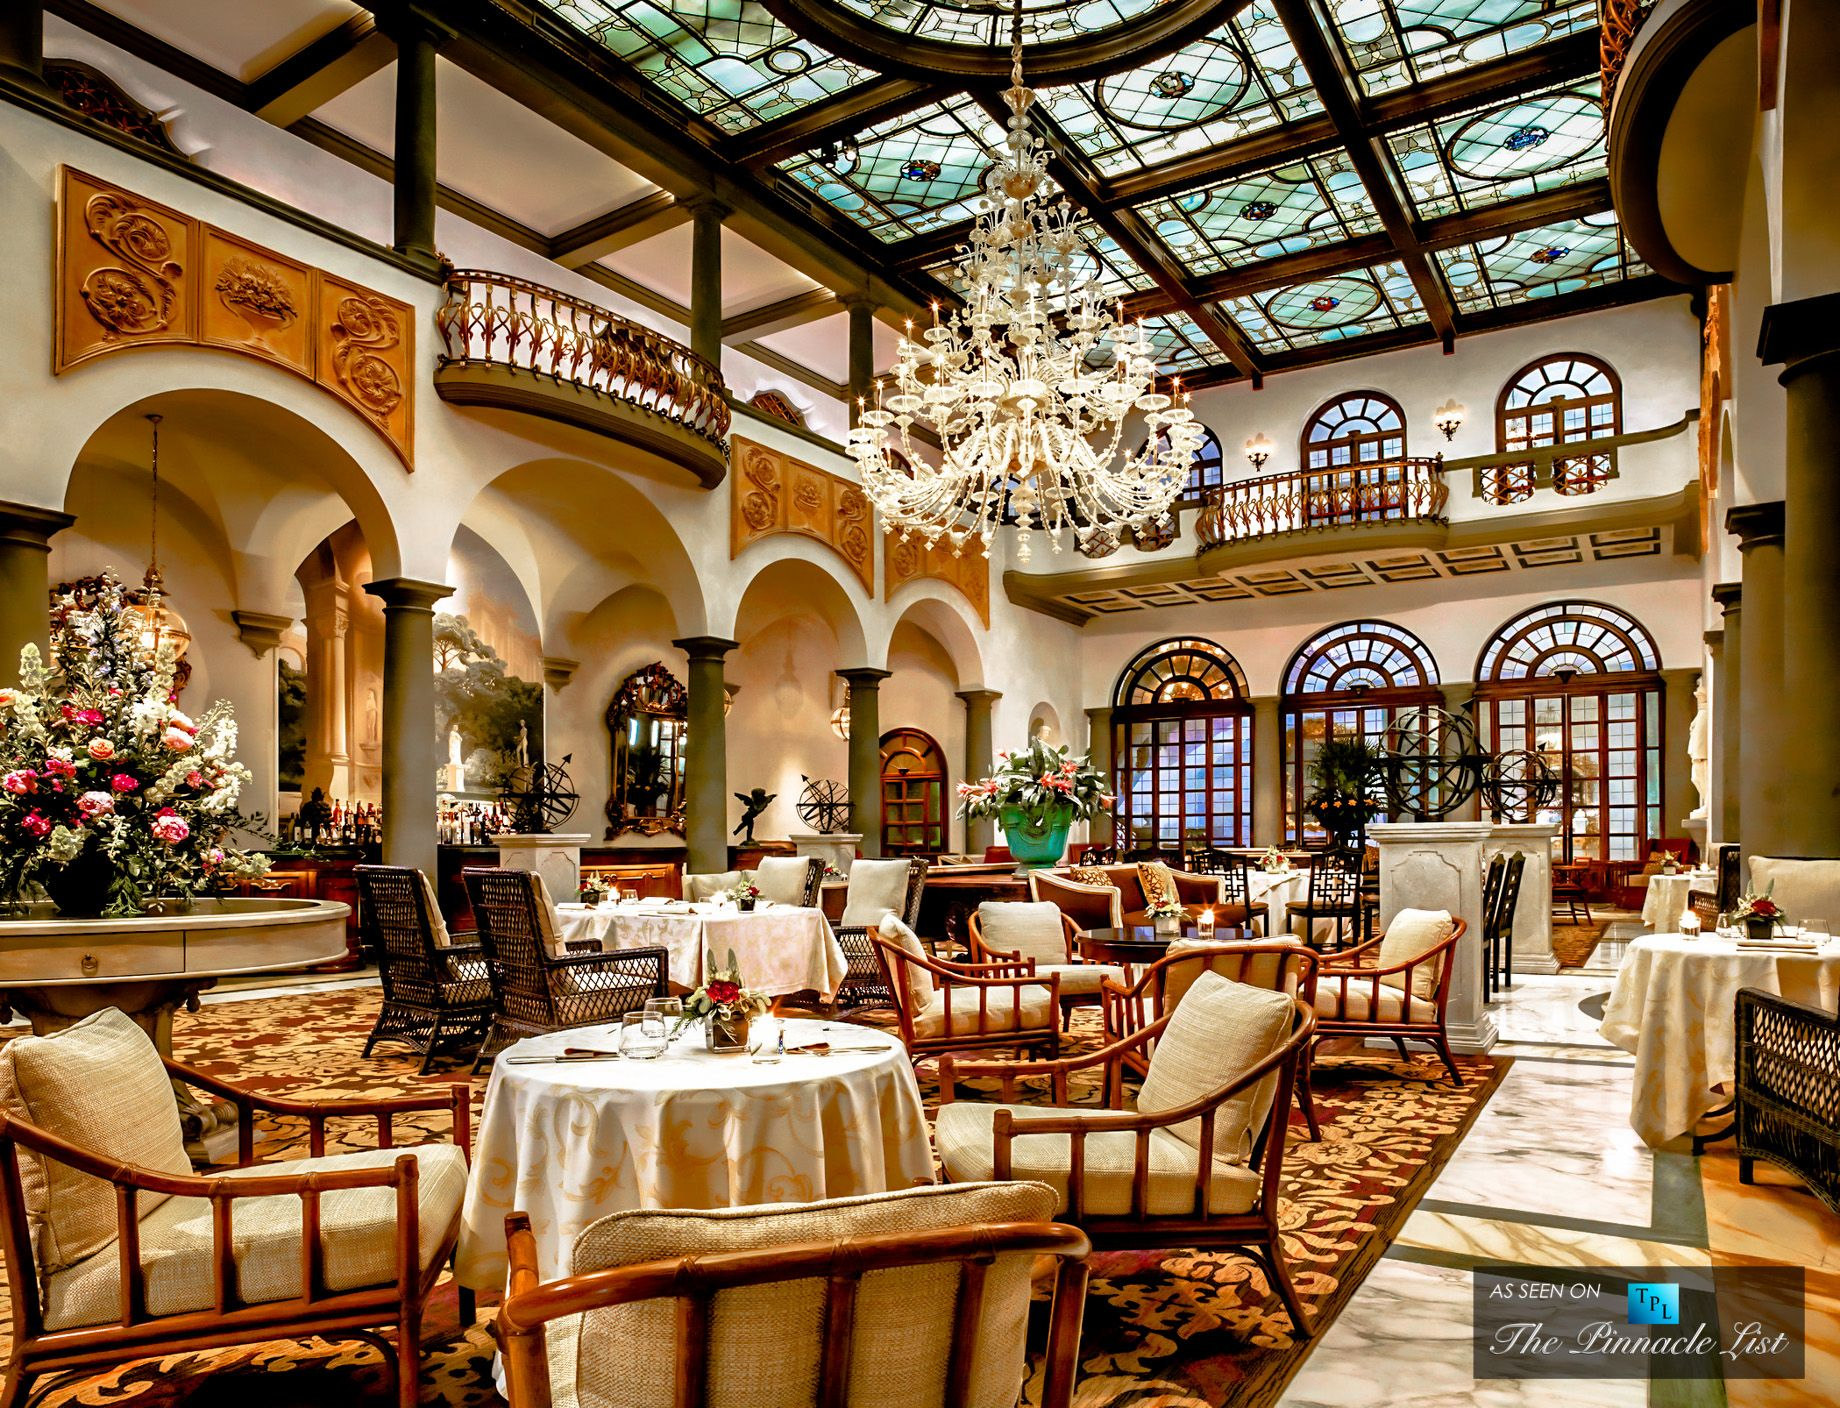 St regis luxury hotel florence italy restaurant for Design hotel florence